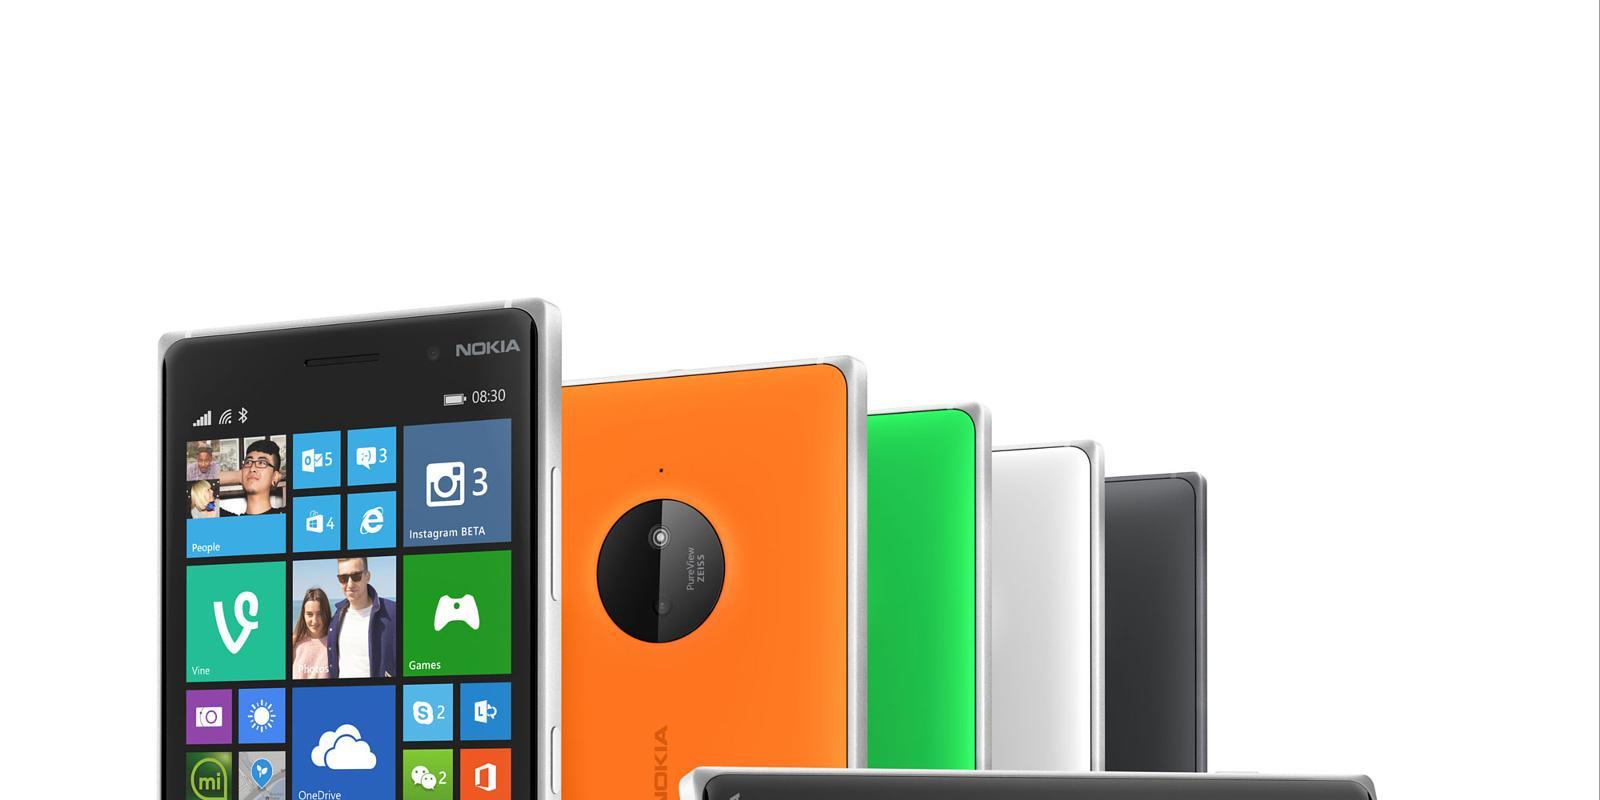 Nokia lumia 830 reviews - Nokia Lumia 830 Review Cool Exterior But The Internals Don T Quite Match